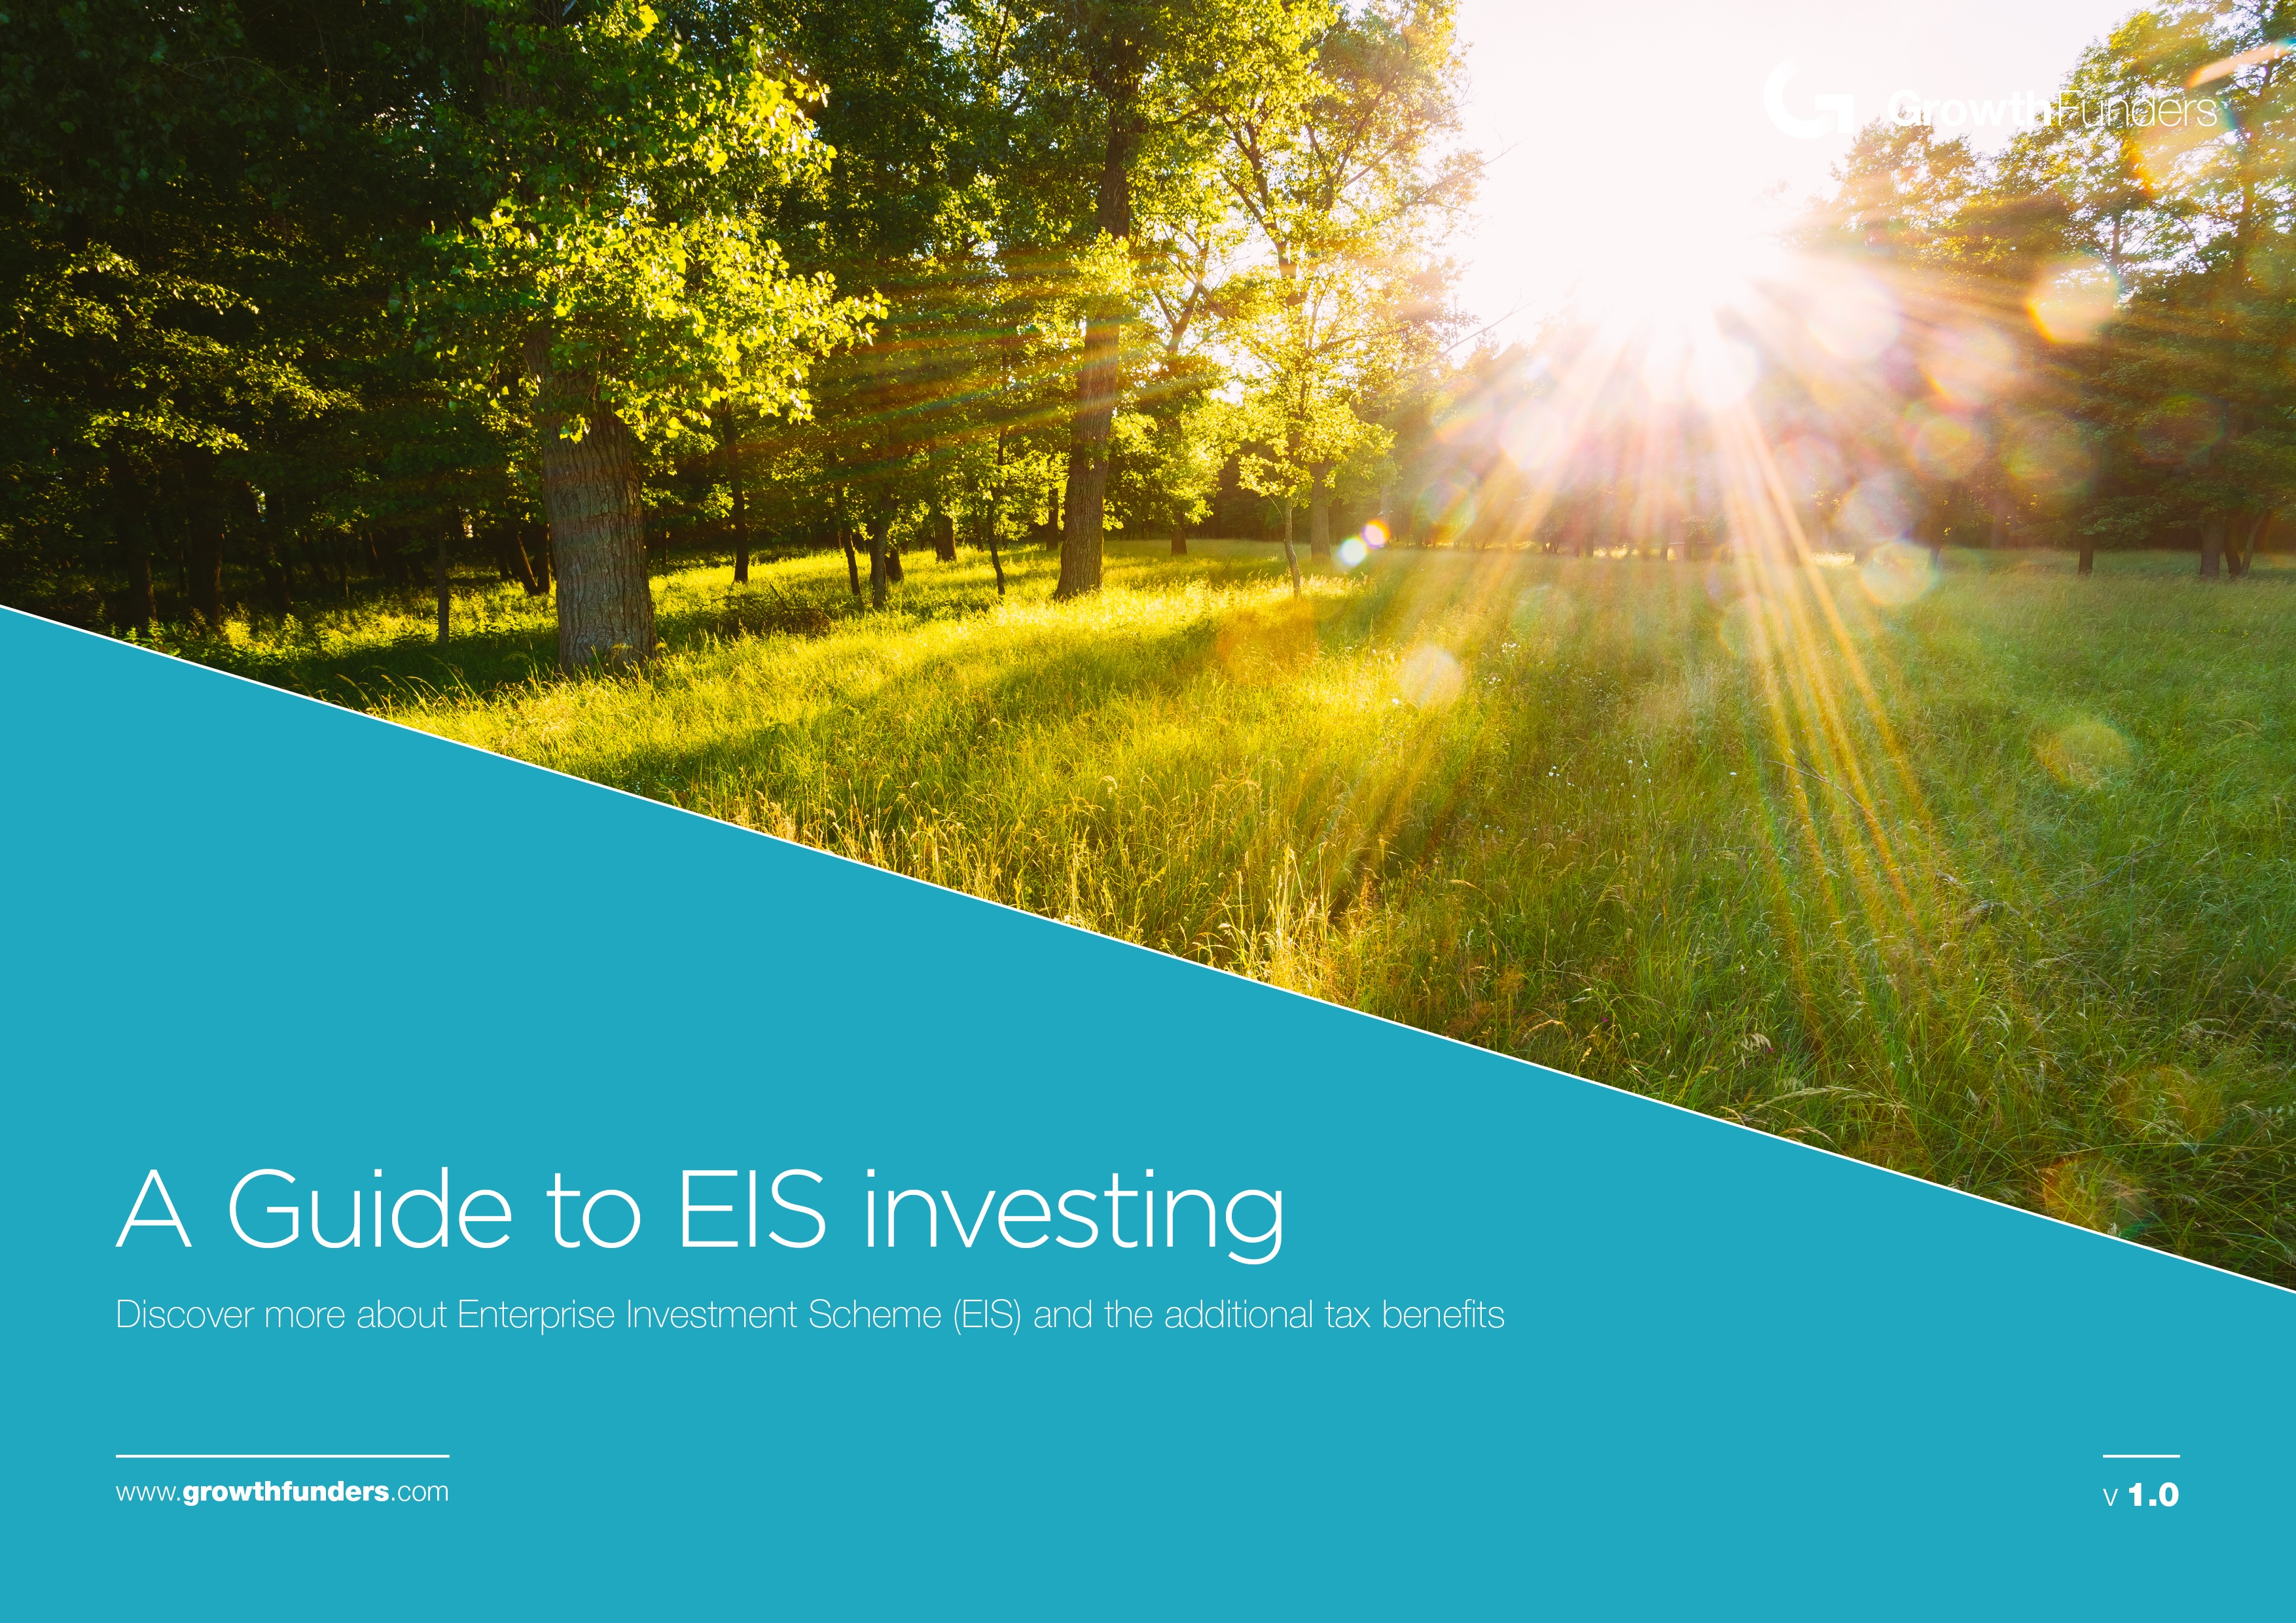 eis-guide-1.jpg